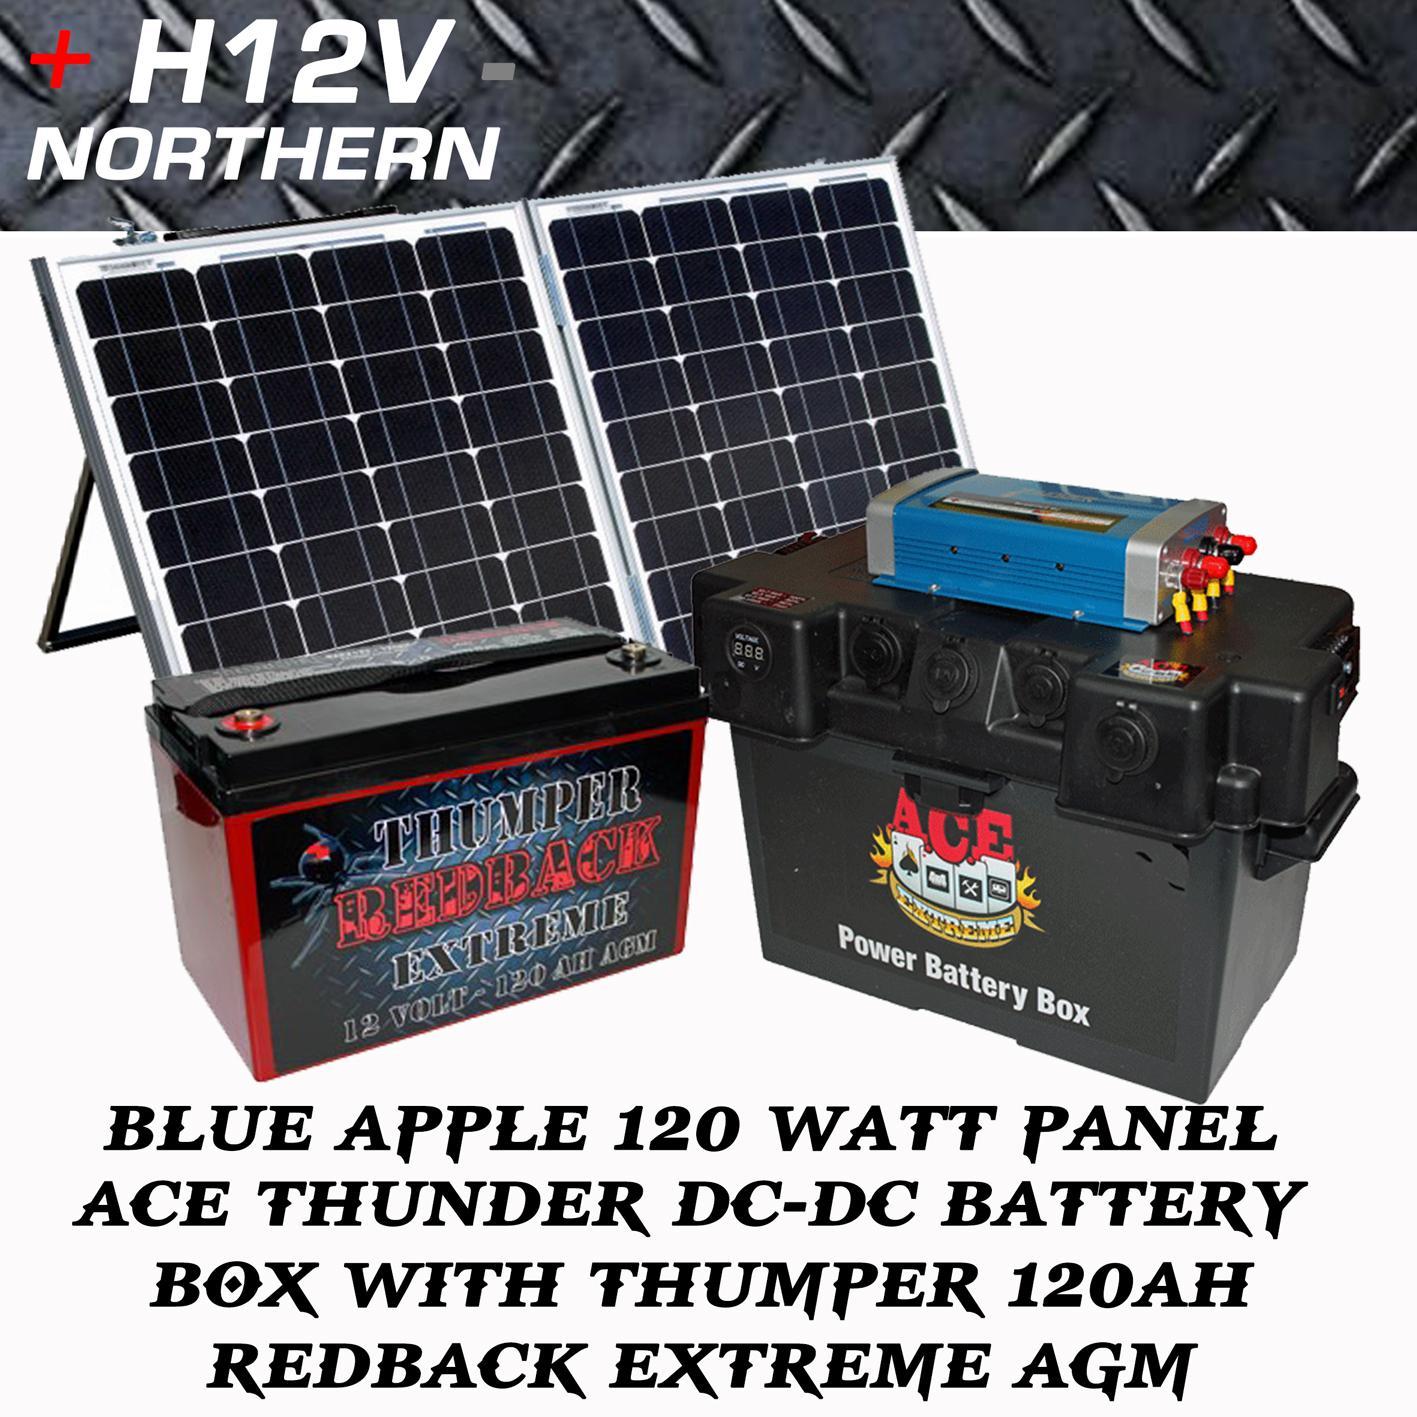 Ba 120 Watt Split Fold Thumper Redback Ext 120ah Ace